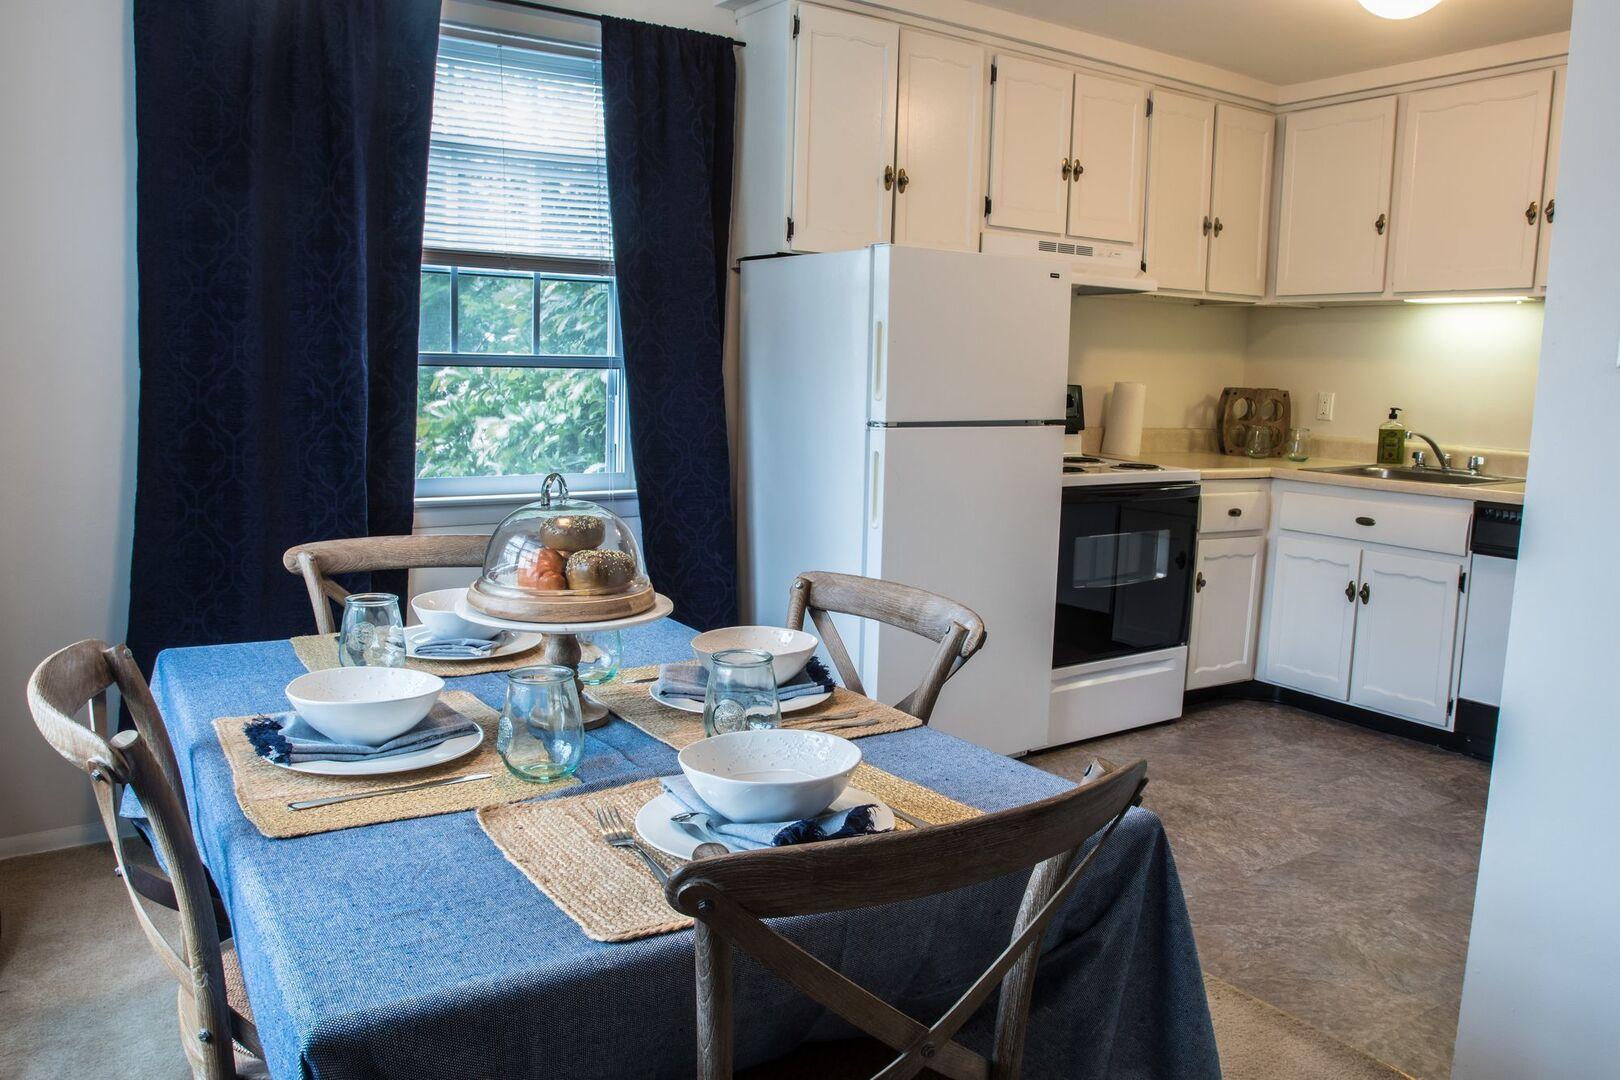 audubon manor apartments west chester pa